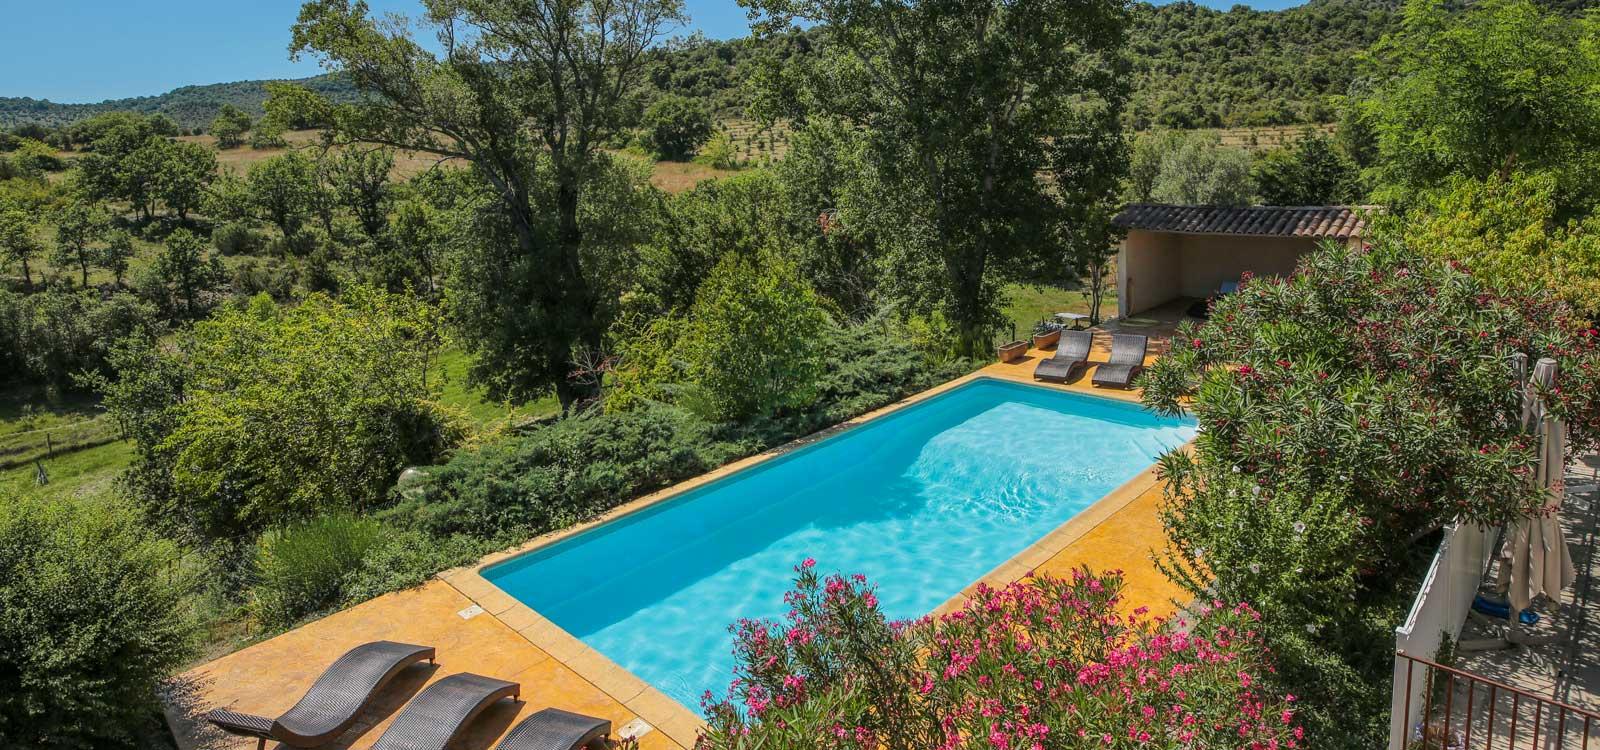 Gîte avec piscine en Ardèche